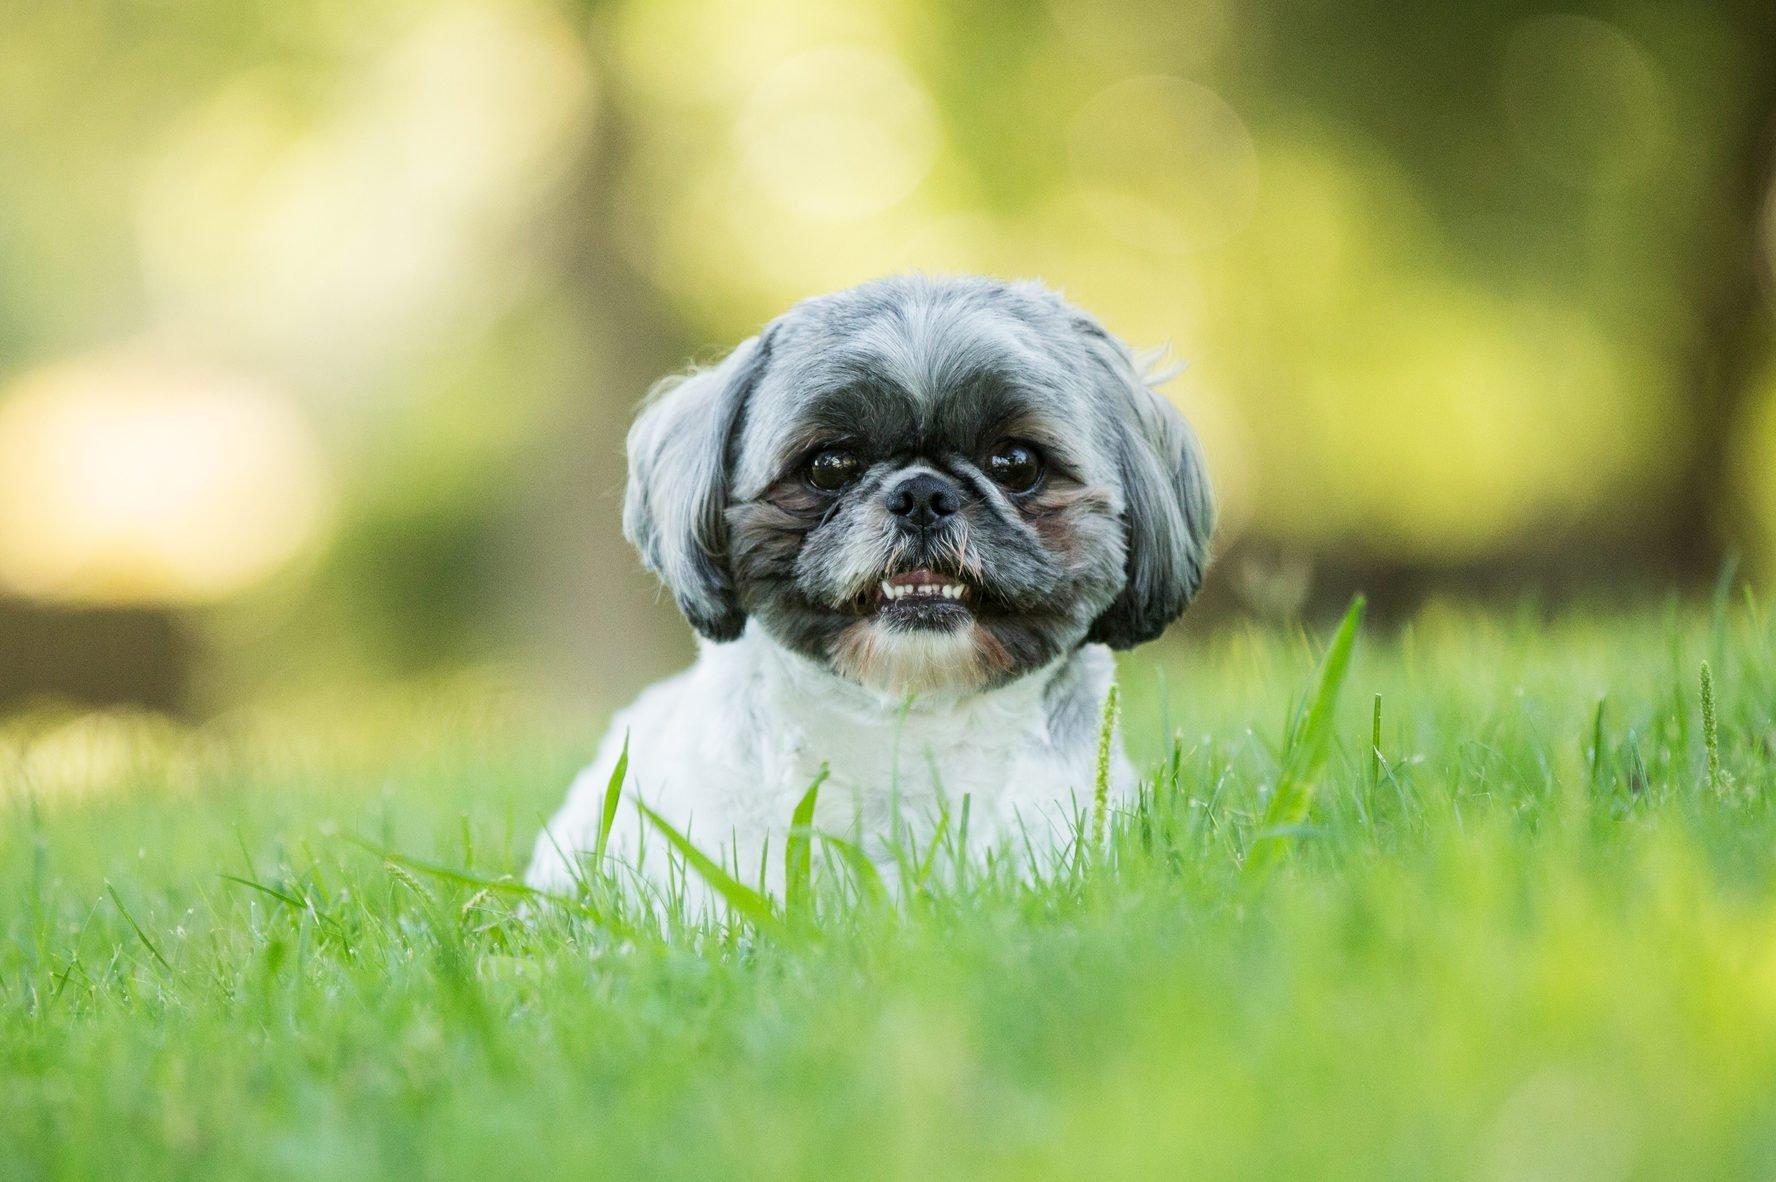 Smiling shih tzu dog laying down outdoors